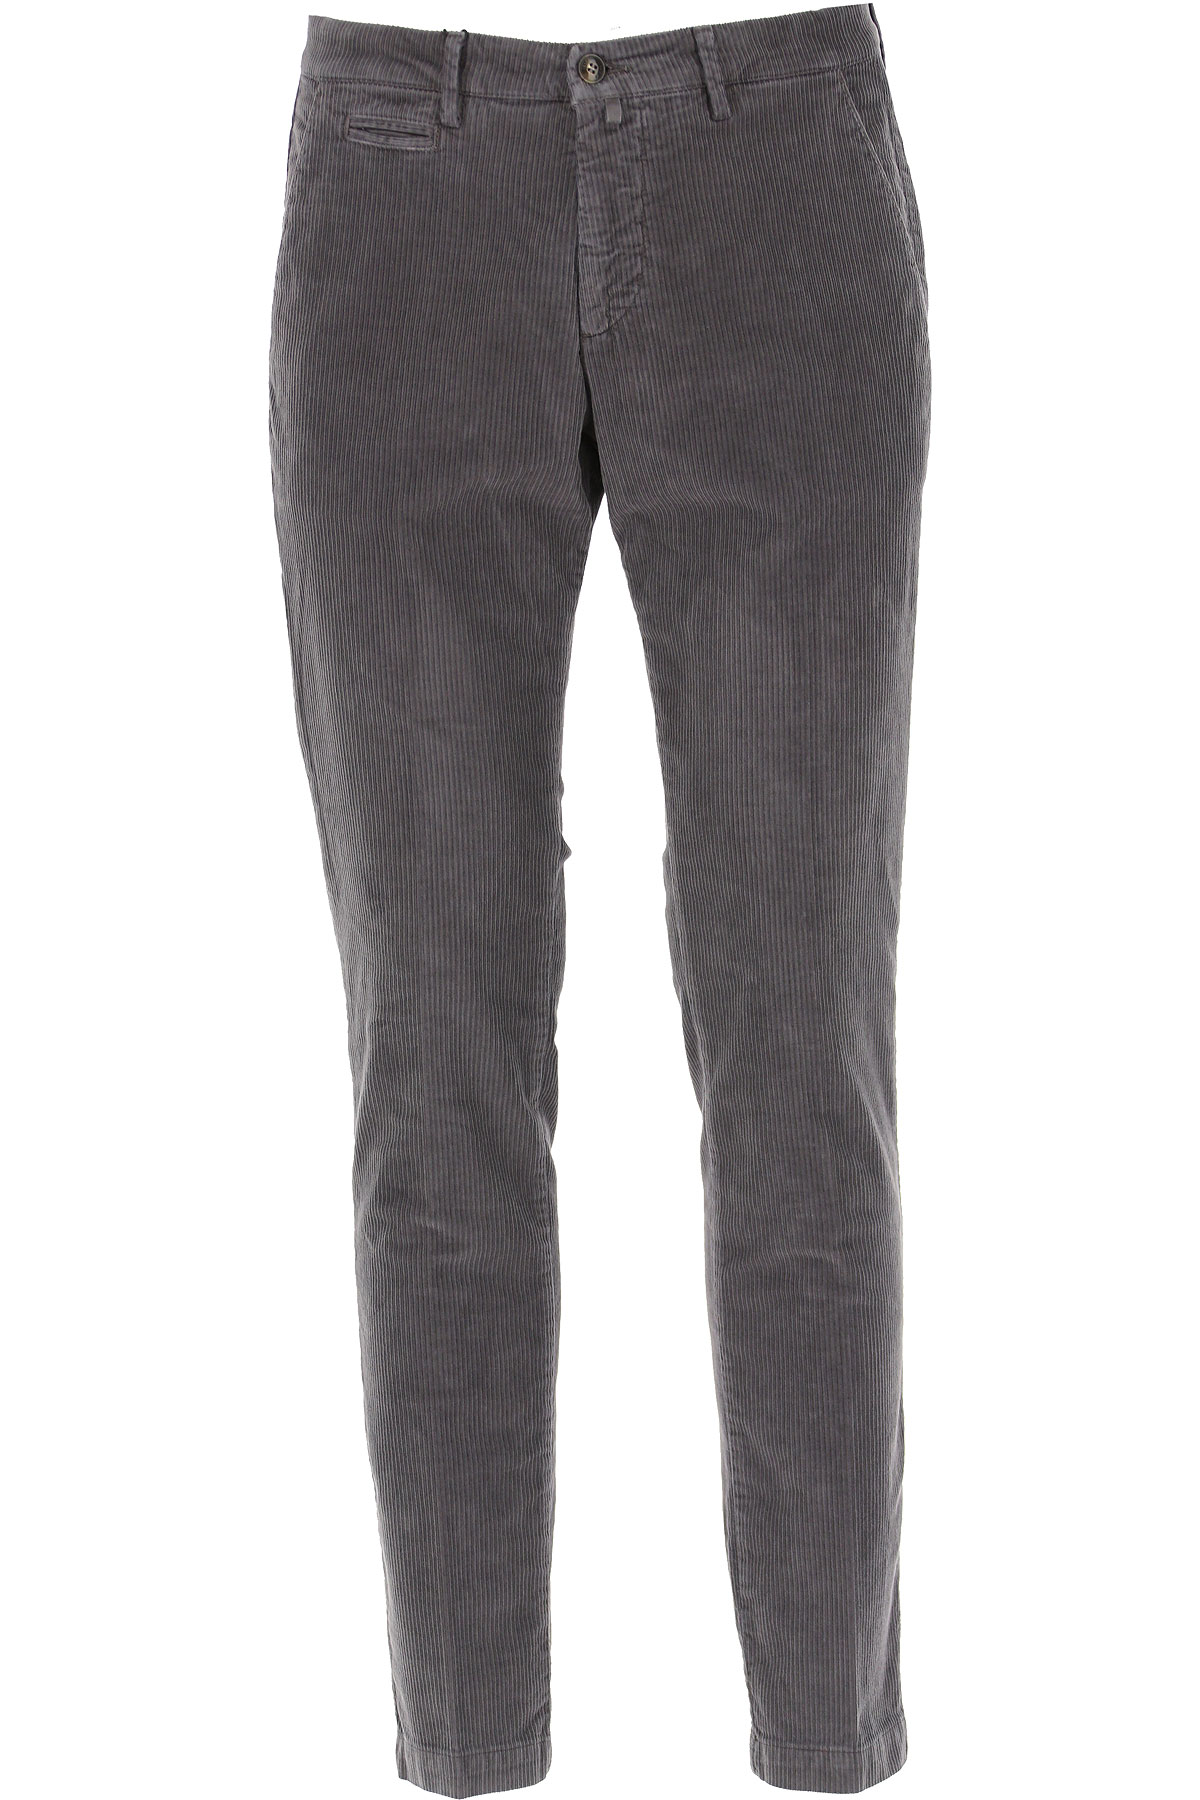 Briglia Pants for Men On Sale, Grey, Cotton, 2019, 31 32 34 36 38